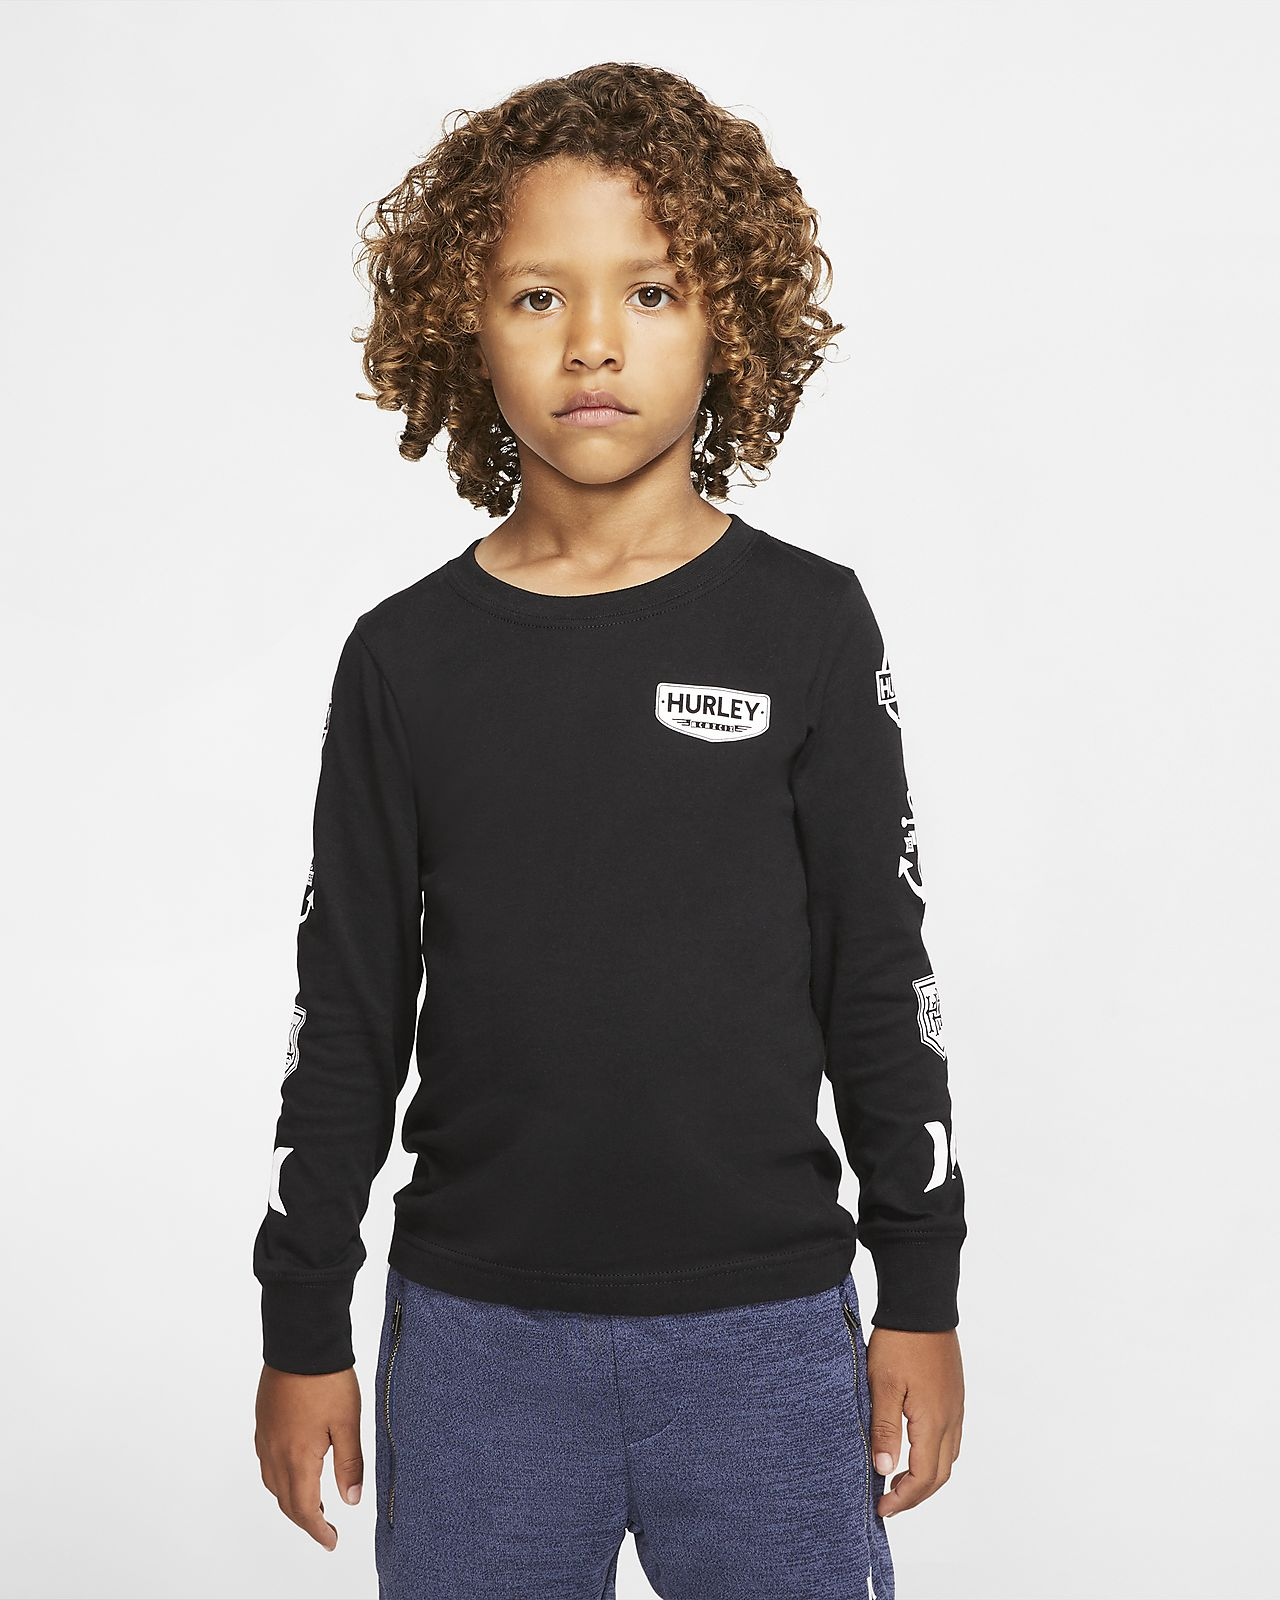 Hurley Patch Sleeve Kids' Long Sleeve T Shirt